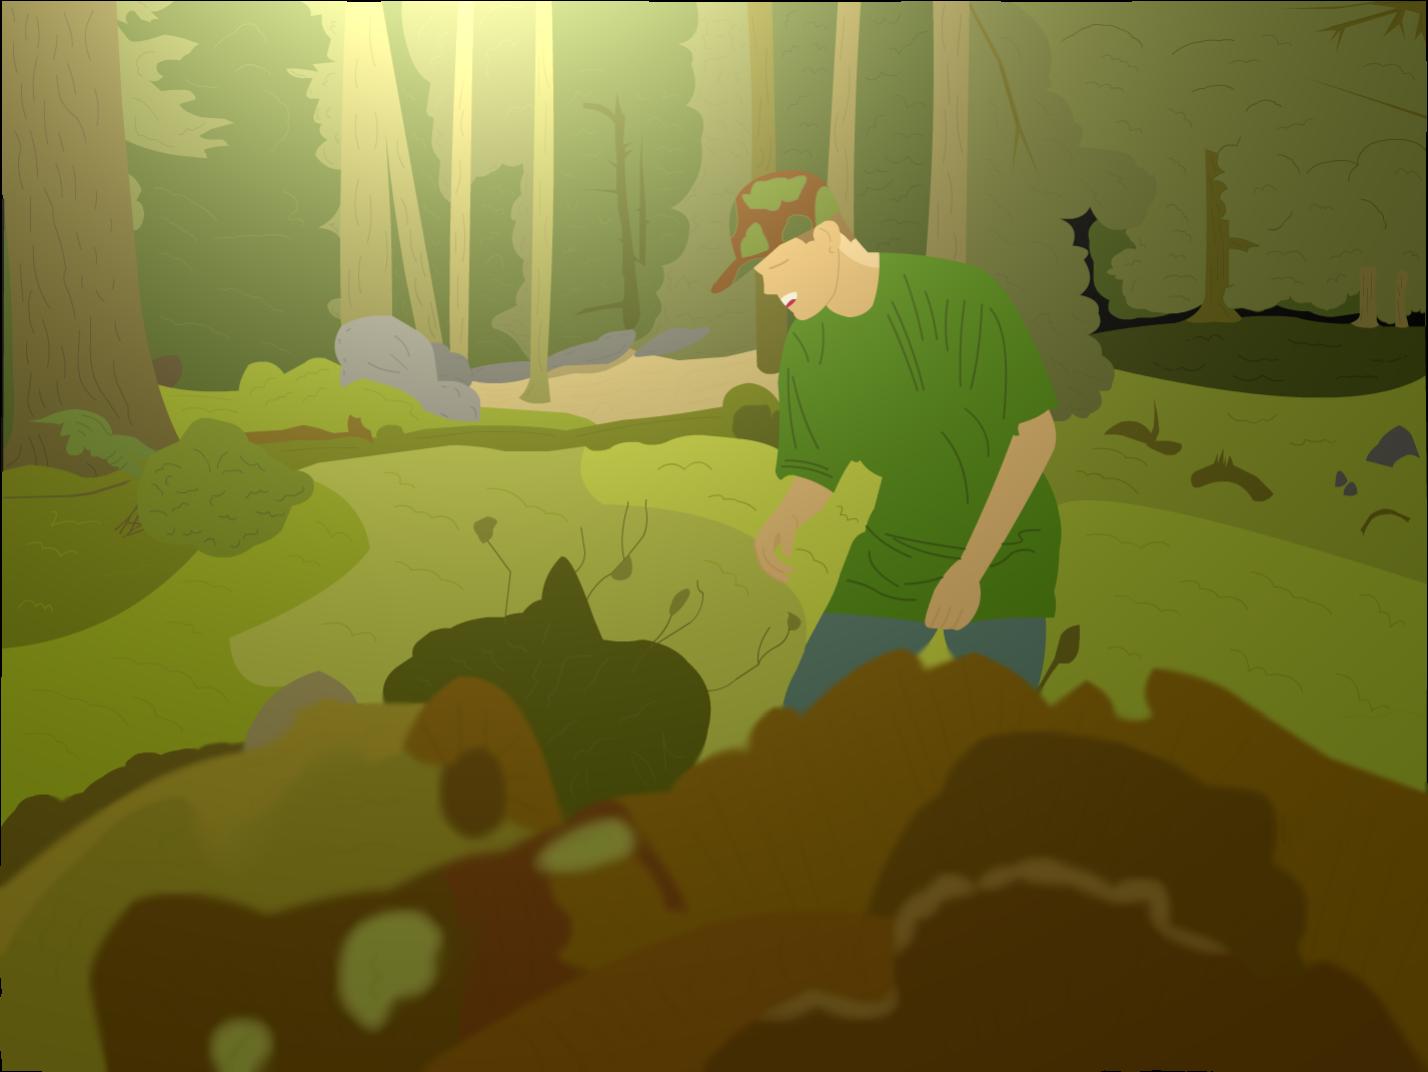 Dan in a forest